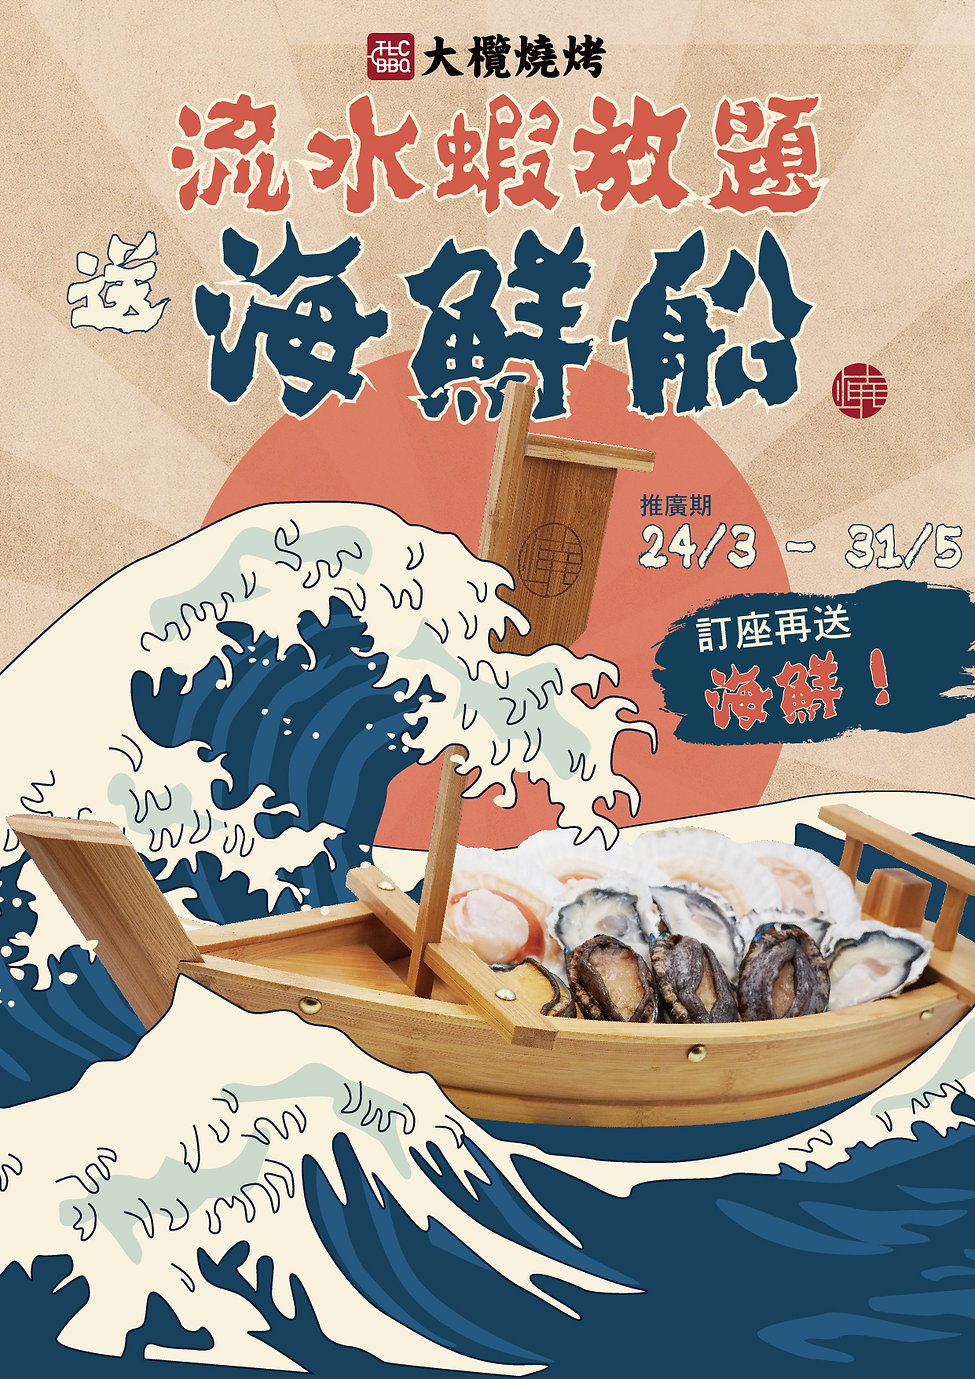 Seafoodboat-02.jpg